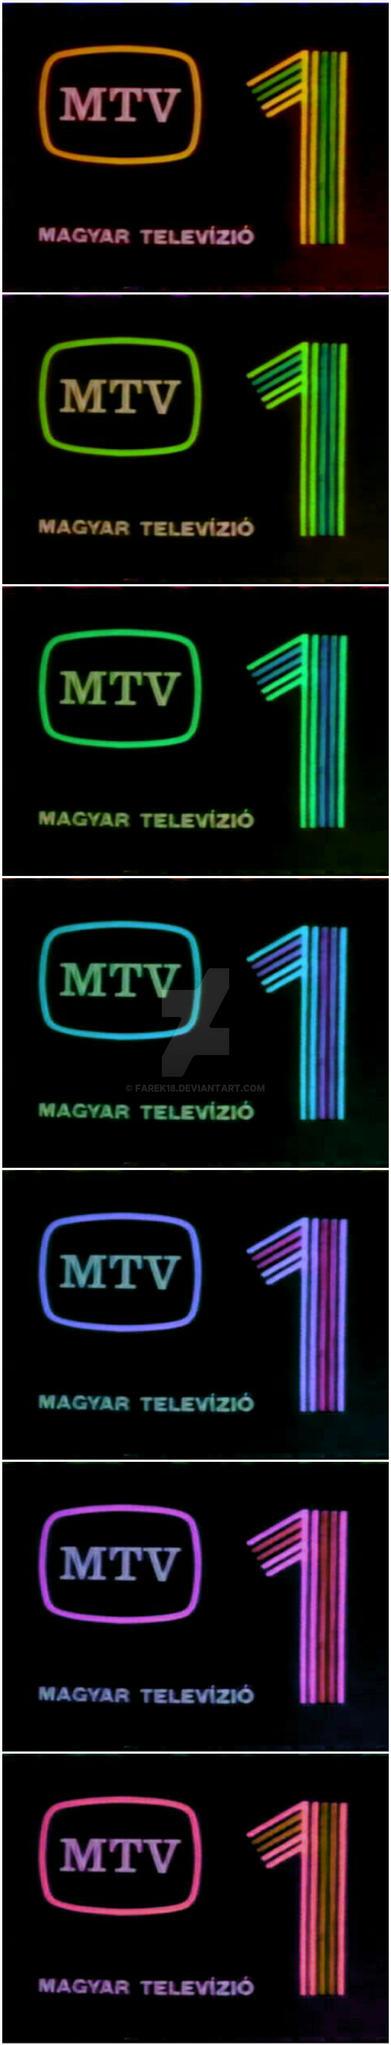 MTV 1 logo color variation #01 by farek18